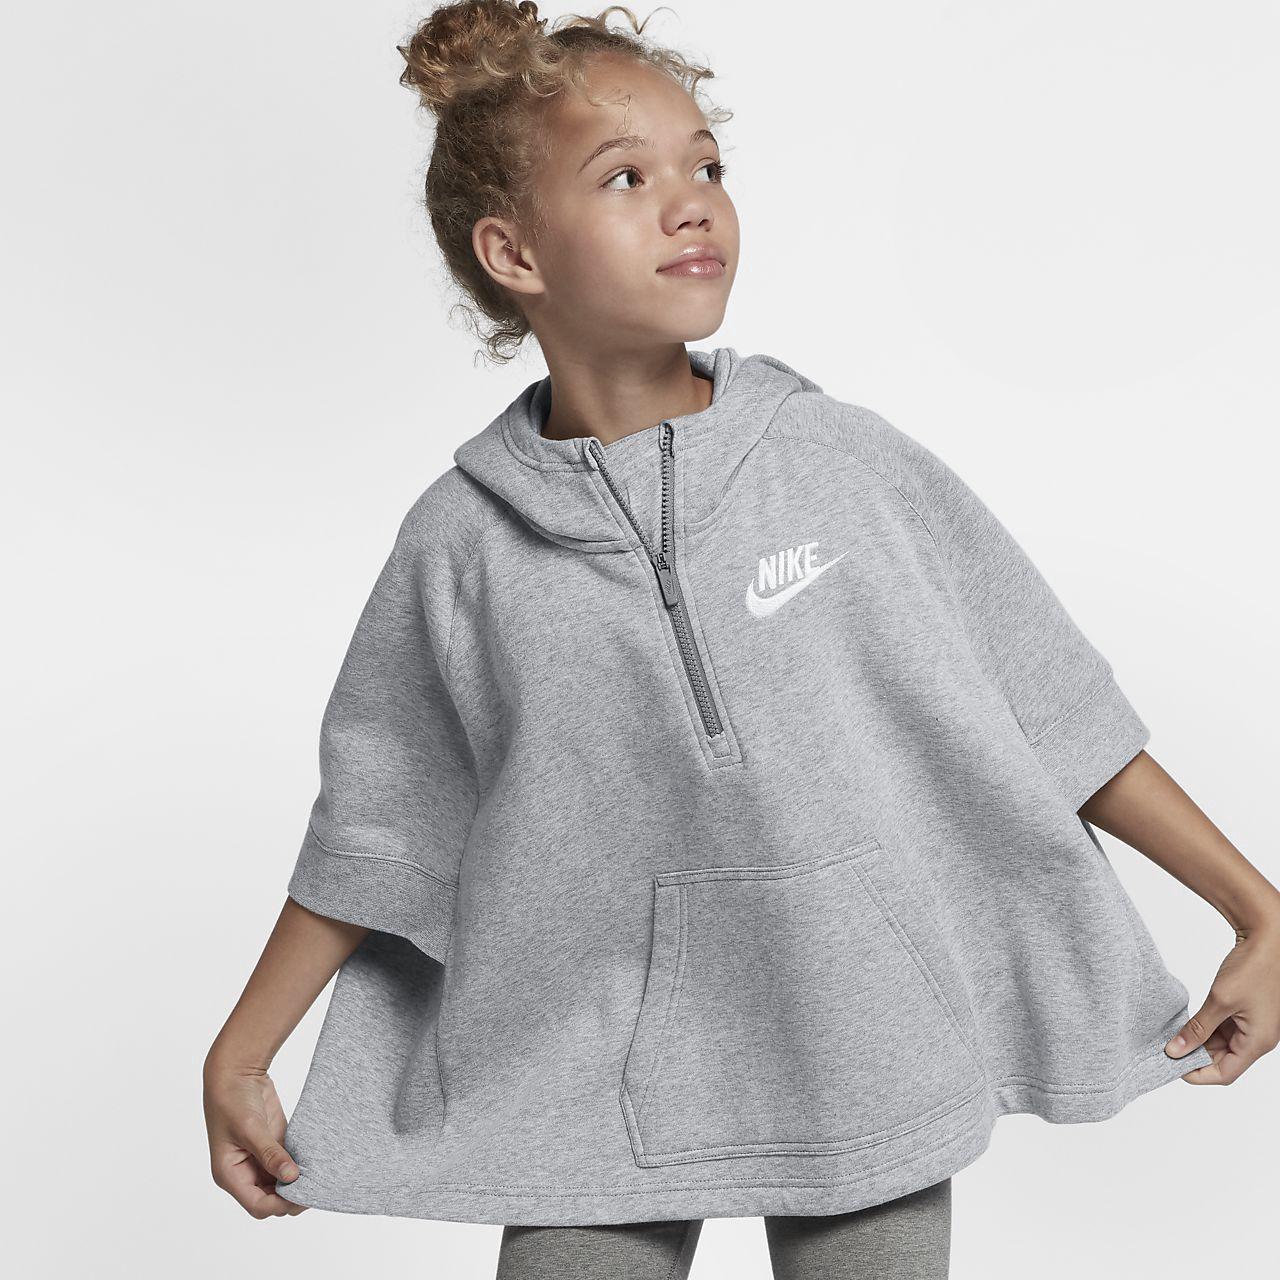 2307a9383fec Nike Sportswear Big Kids  (Girls ) Pullover Half-Zip Poncho - M (10-12) Grey